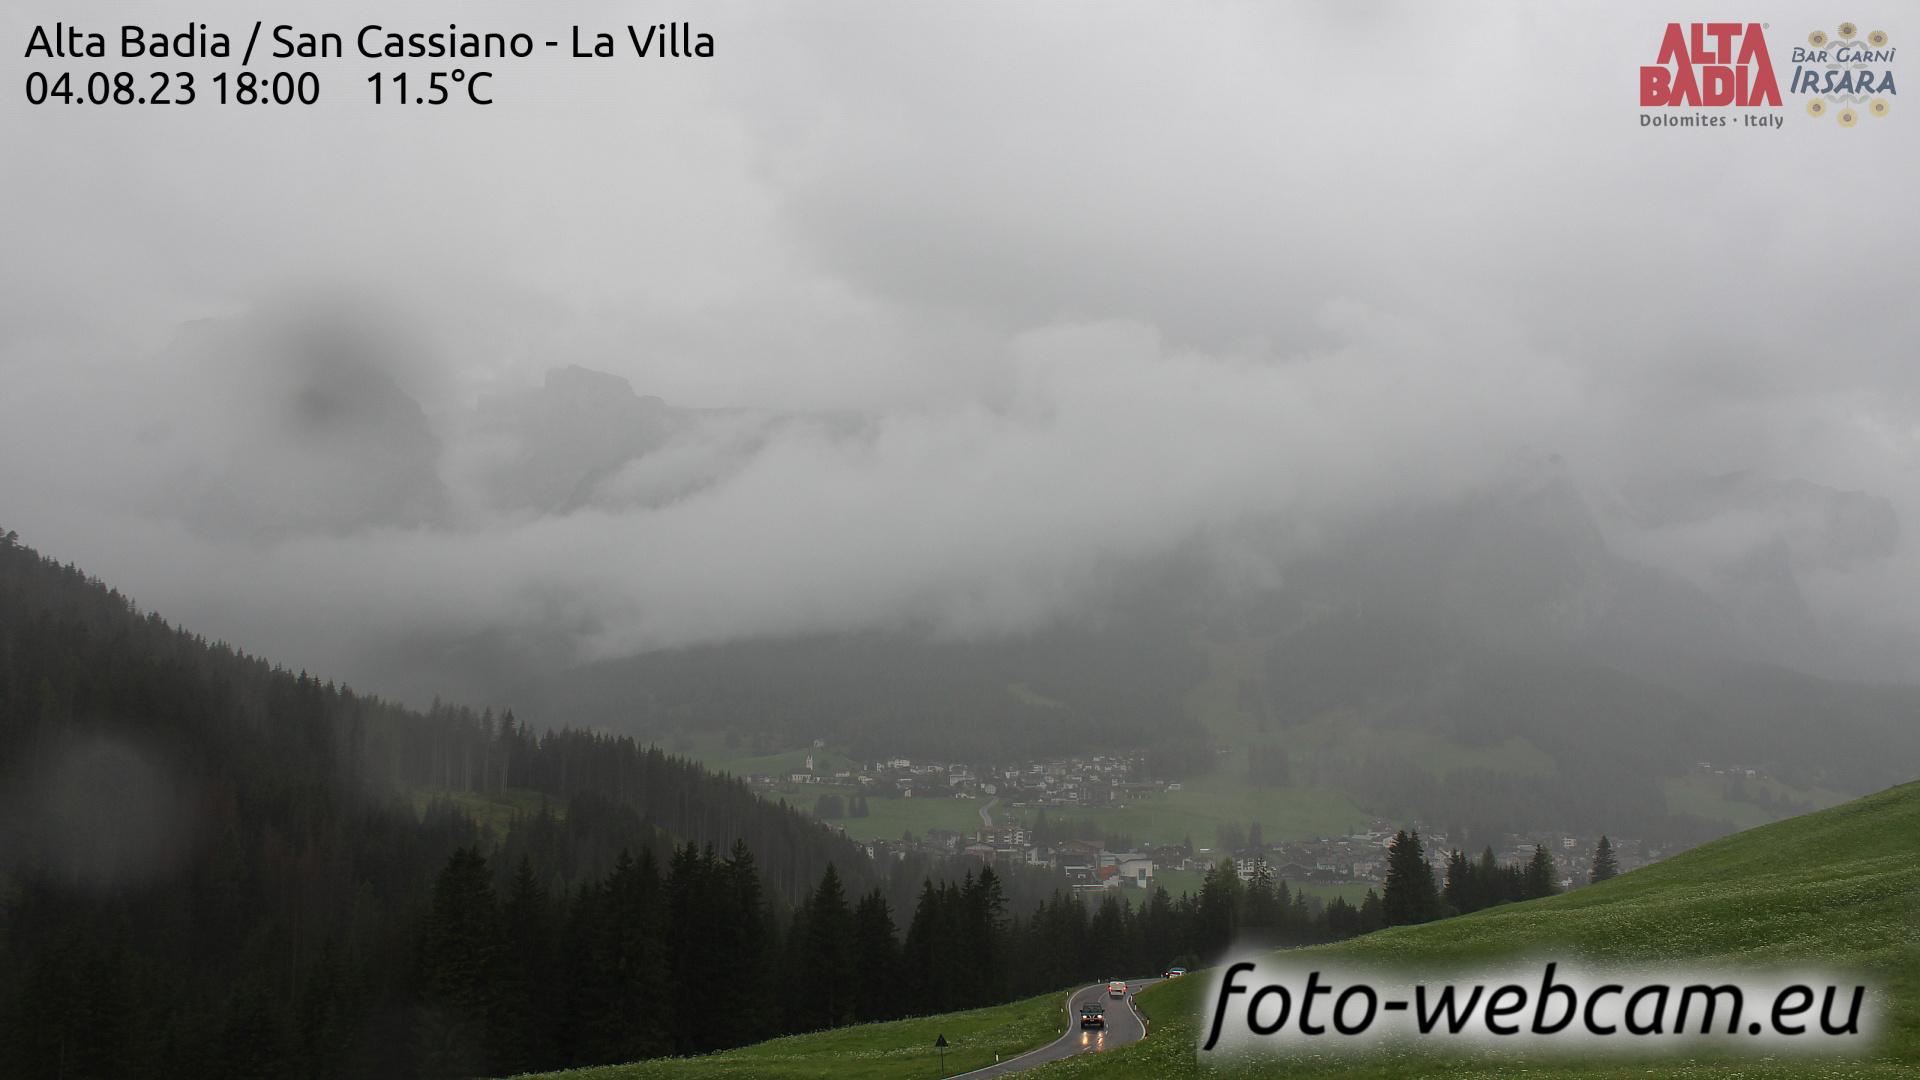 San Cassiano Sun. 18:04